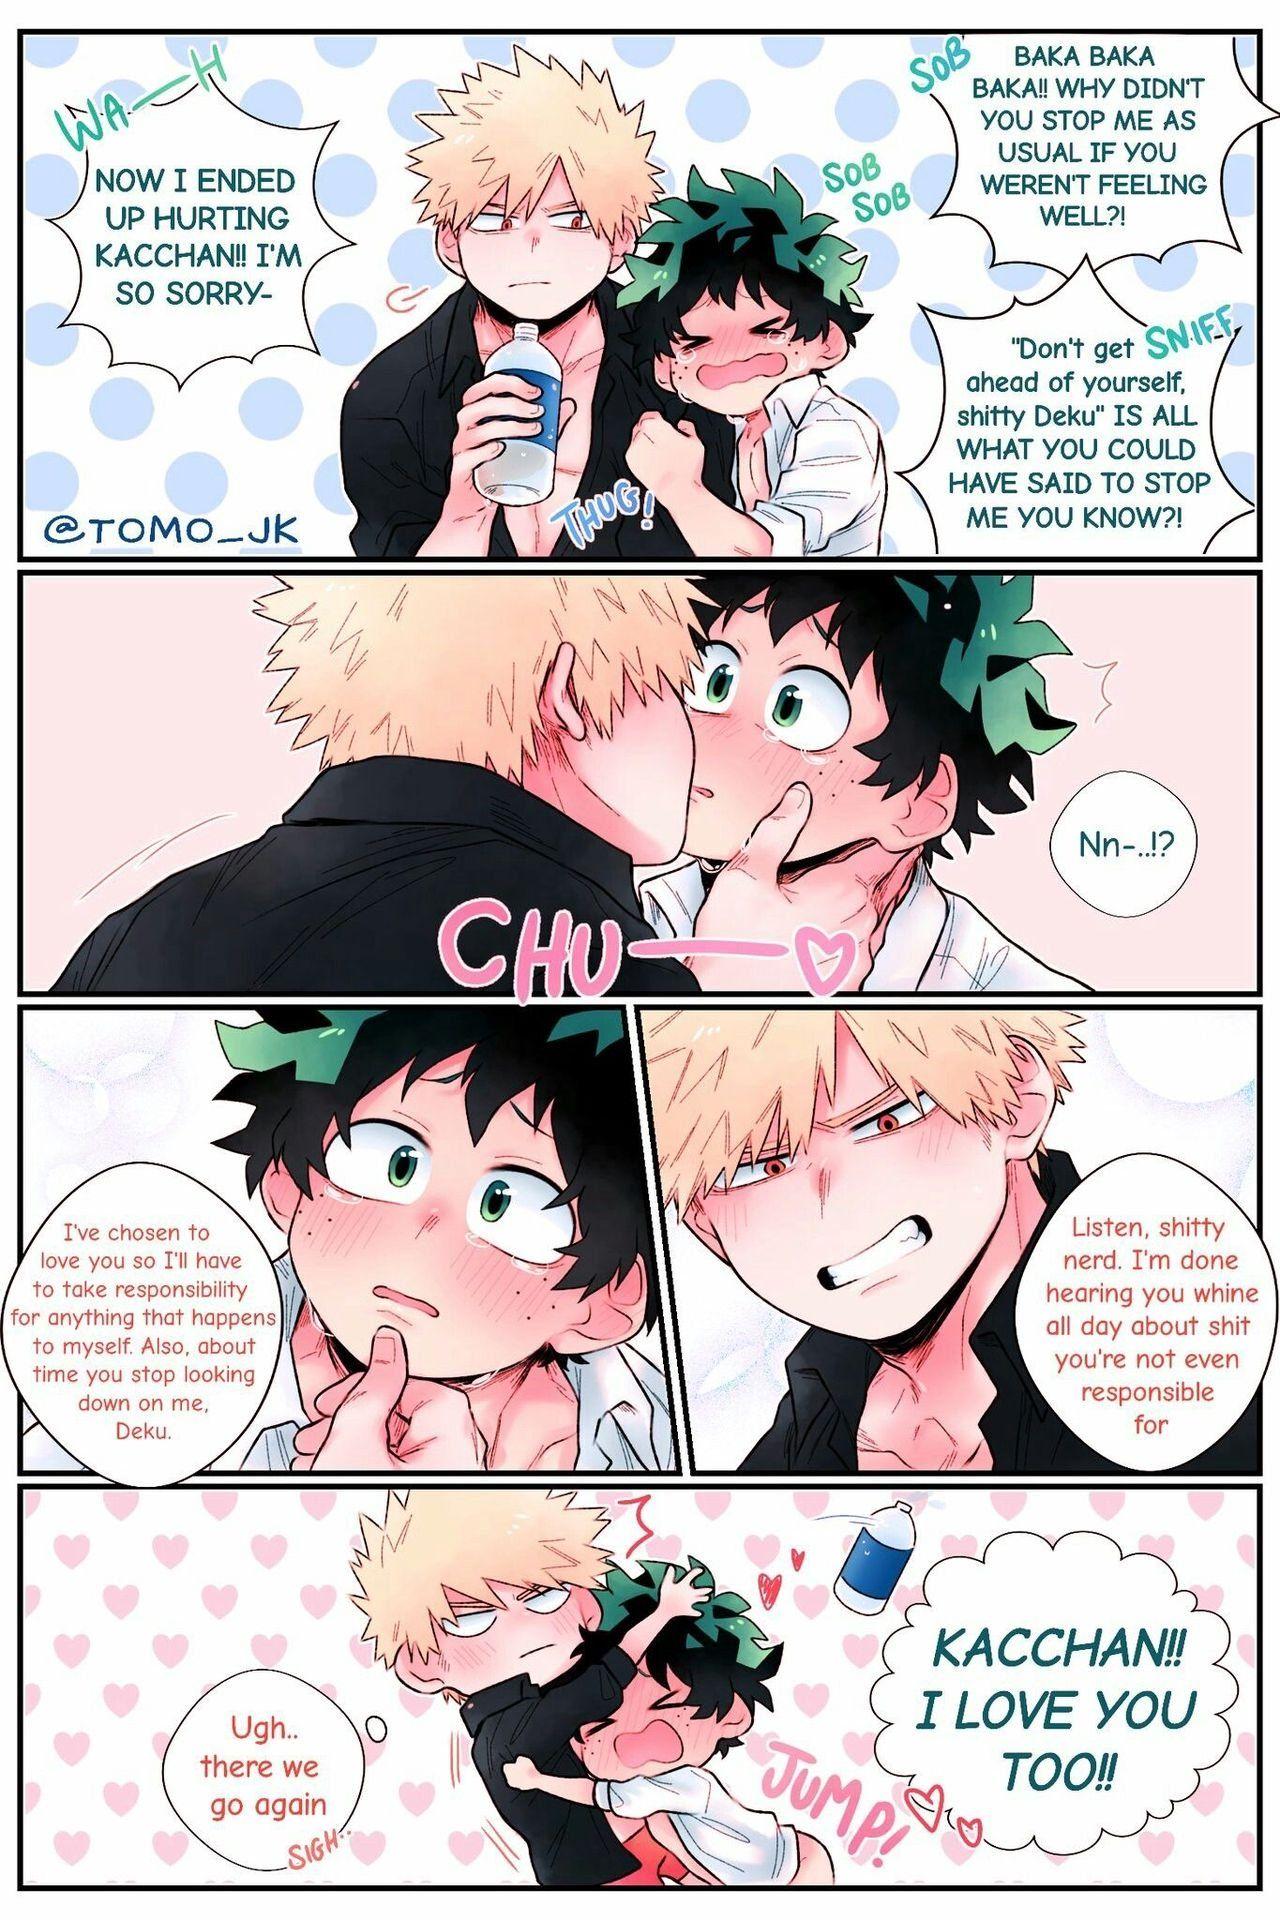 Omg What If Bakugo Was Actually Like This Thanks Horikoshi For Not Making Deku So Emo Cou My Hero Academia Manga My Hero Academia Memes My Hero Academia Shouto